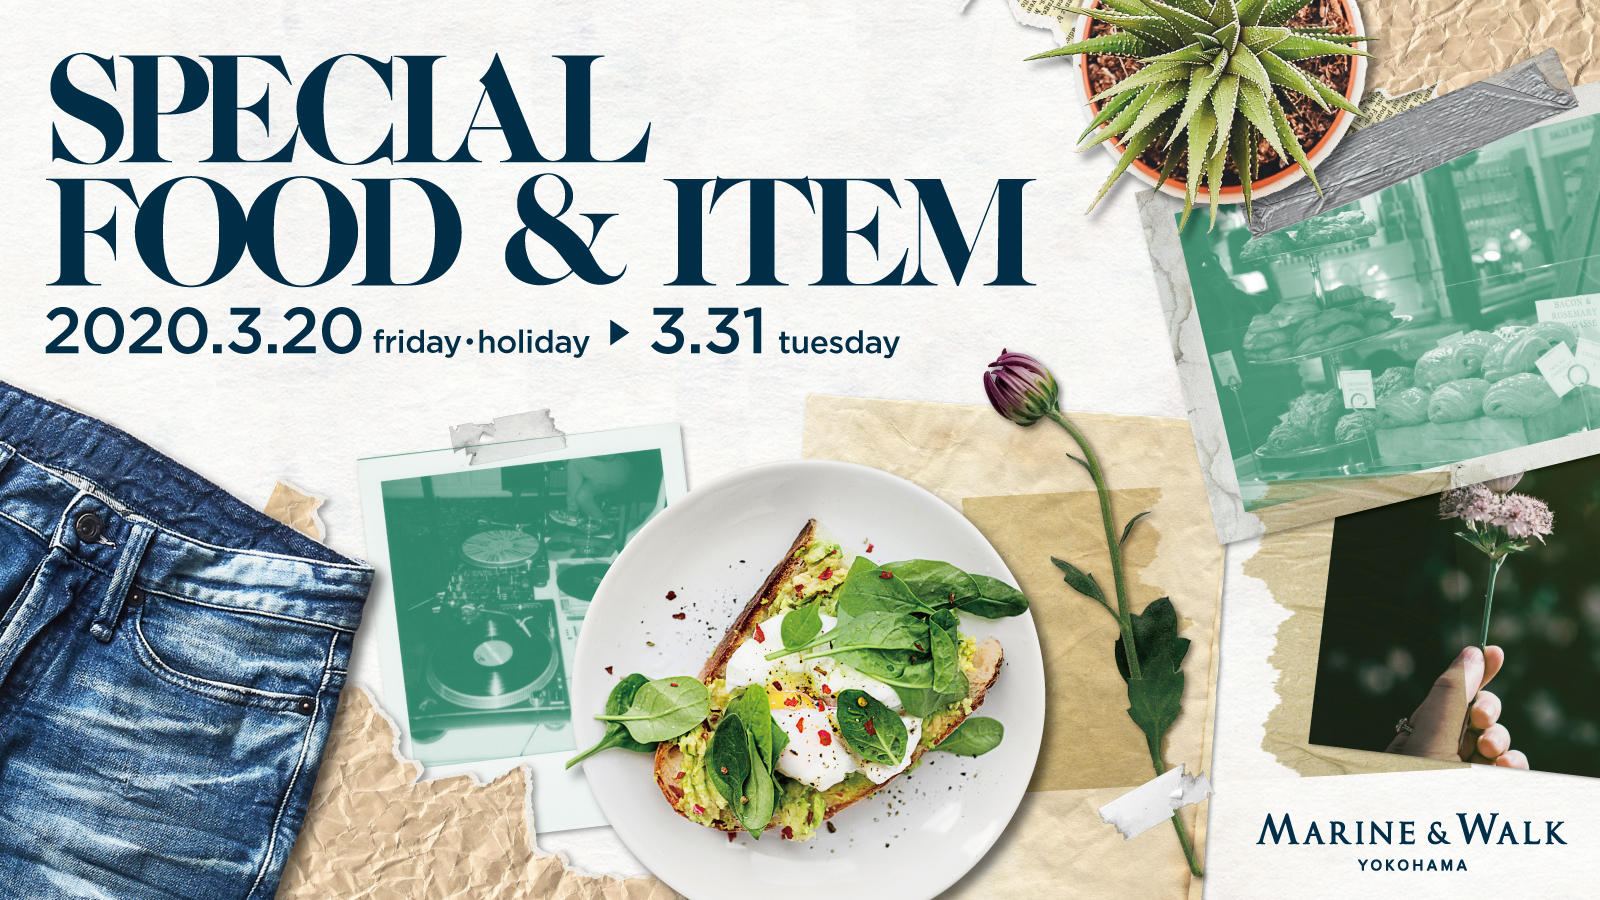 2020.3.20Fri・holiday~3.31.Tue SPECIAL FOOD&ITEM